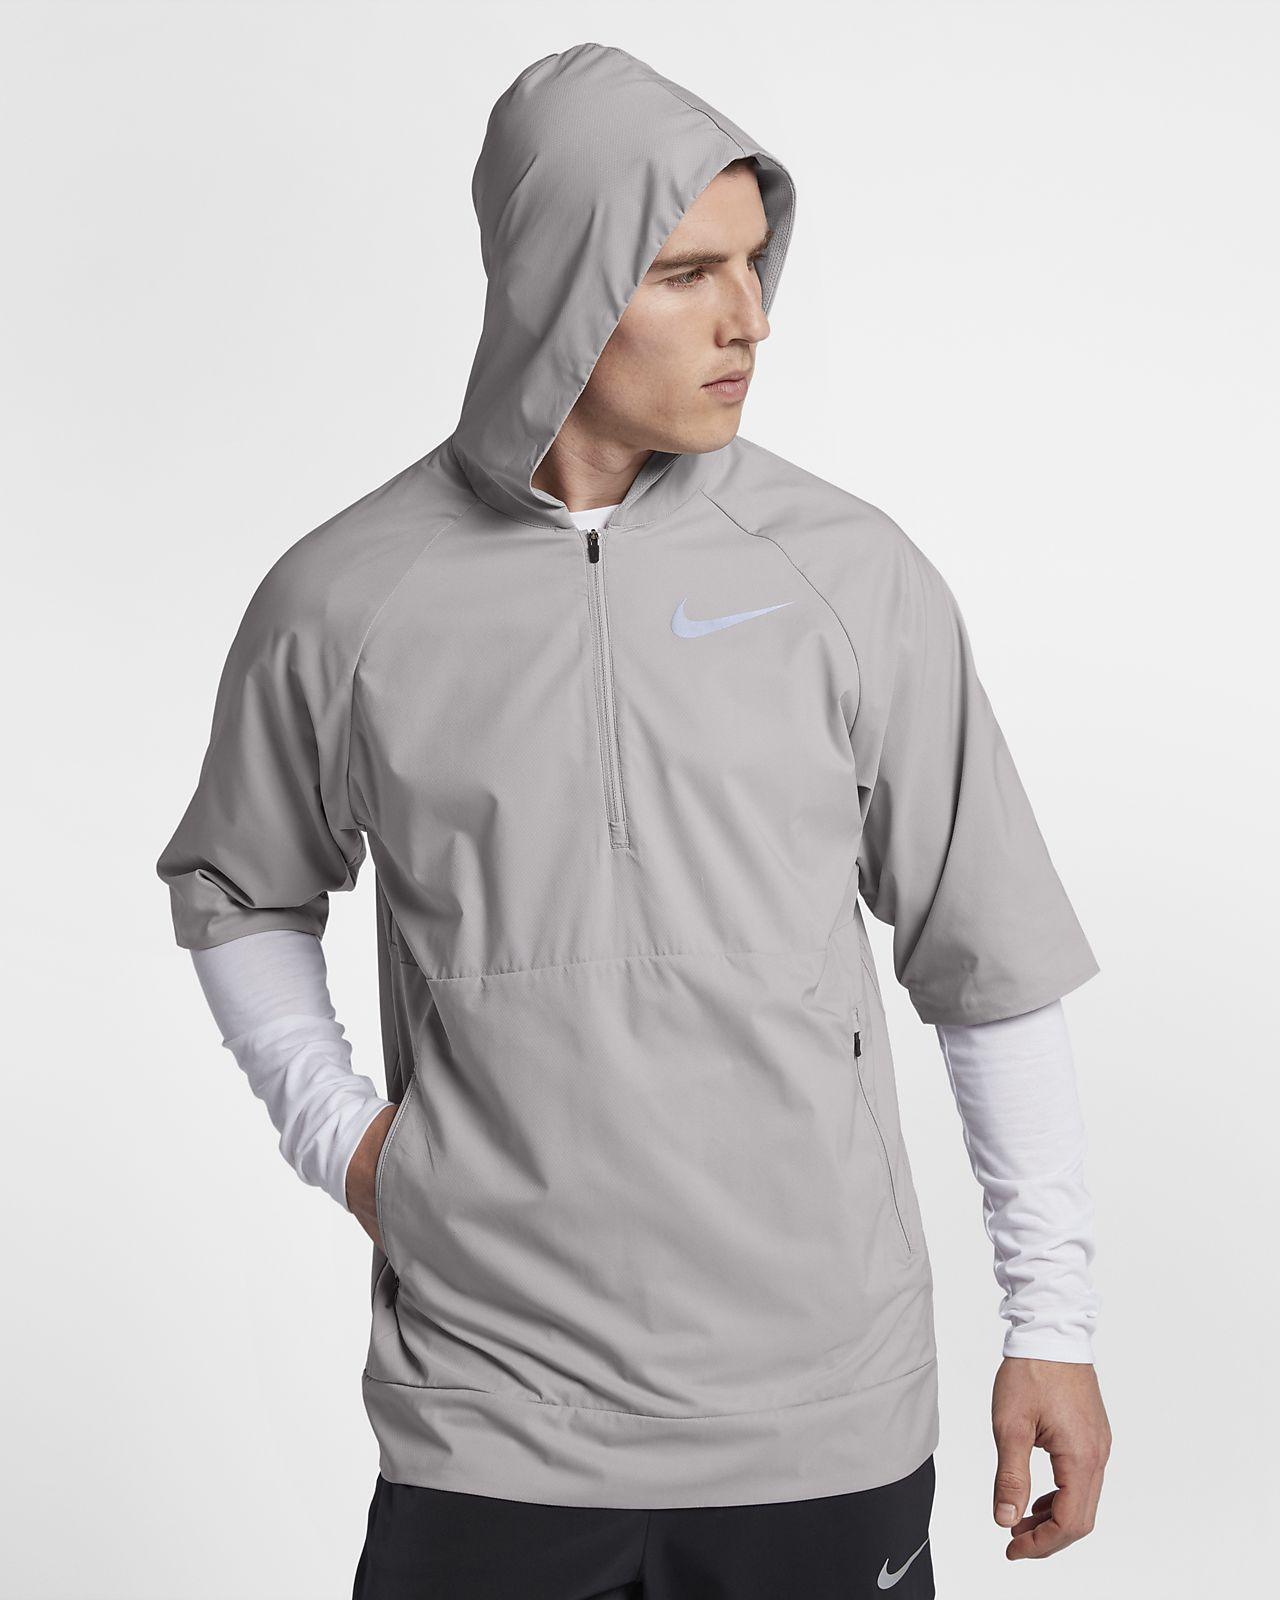 premium selection 7dba3 e03a0 ... Nike Flex Mens Running Jacket